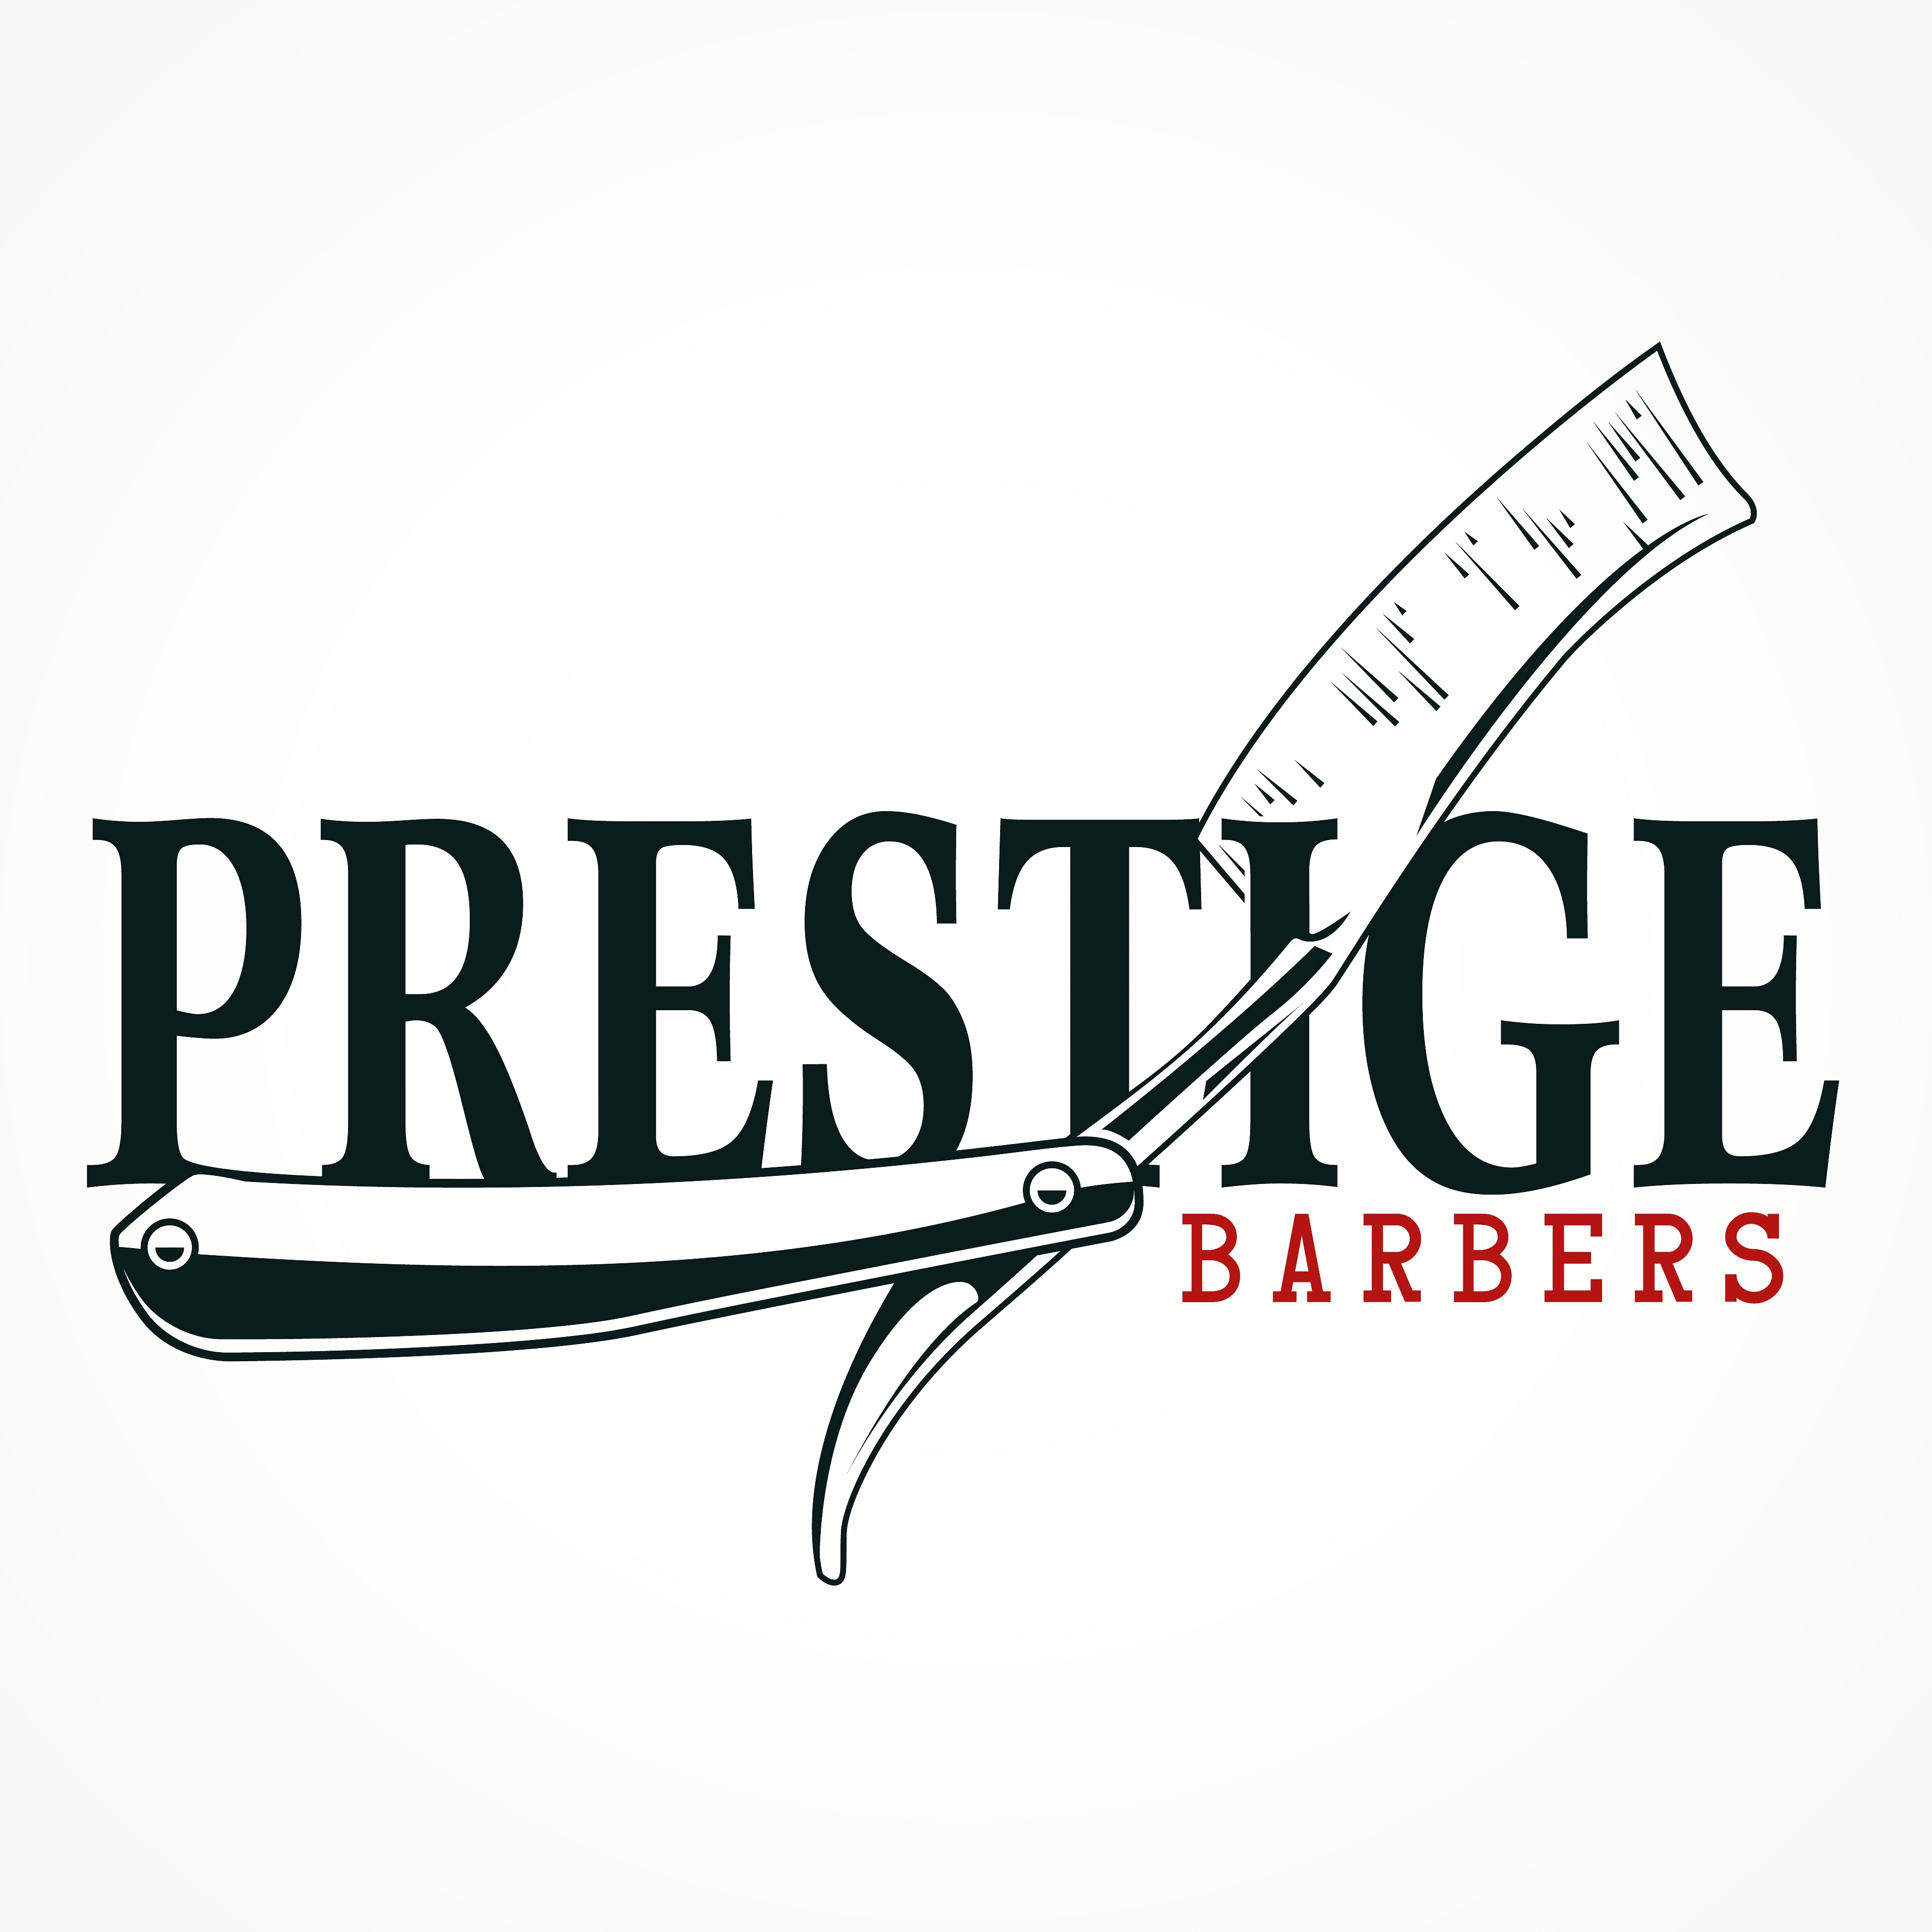 Prestige Barbers